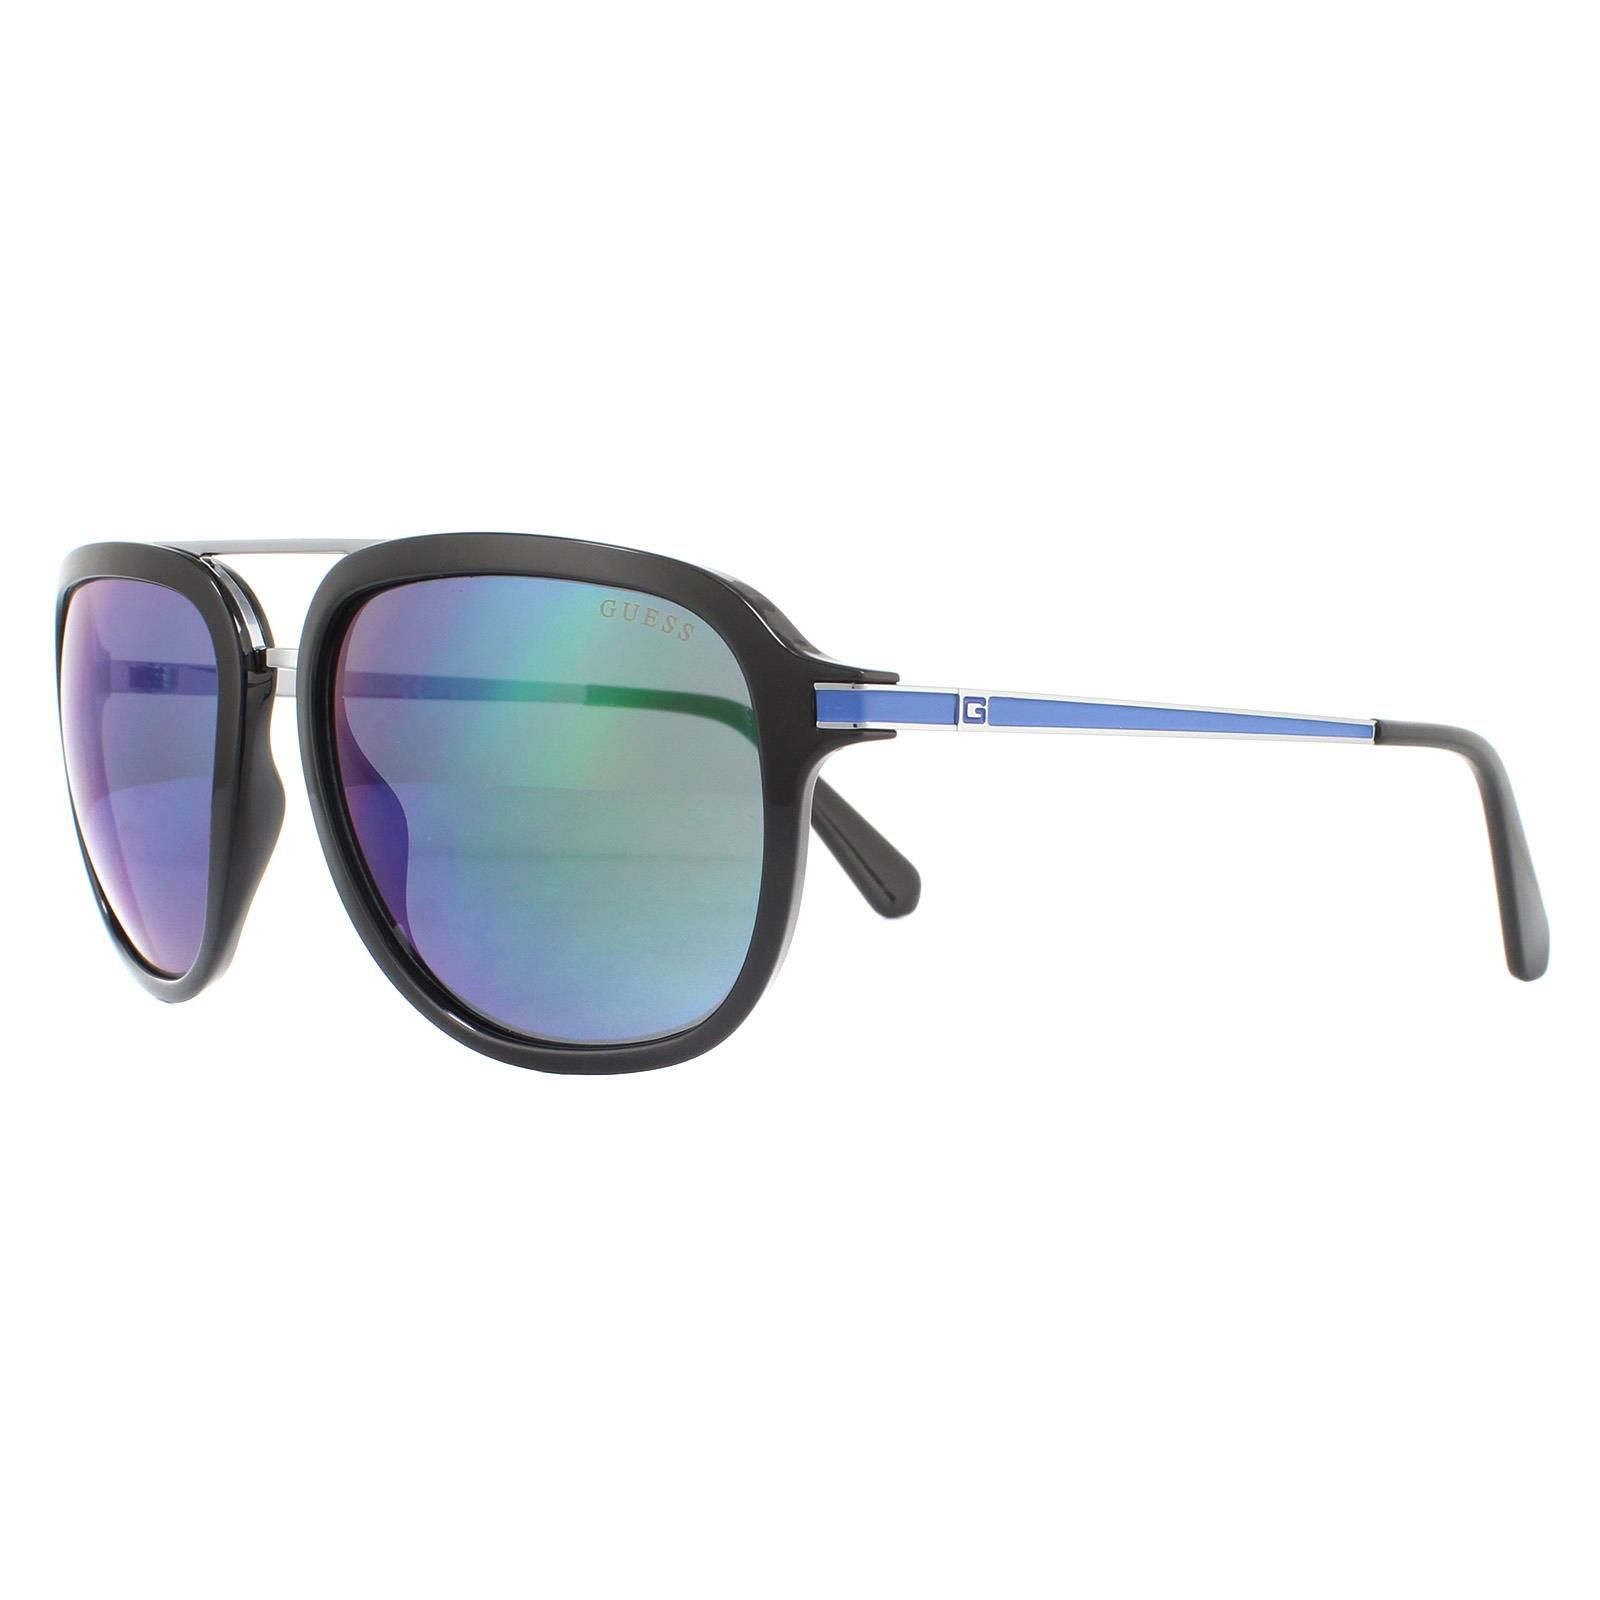 Guess Sunglasses GU6965 01C Shiny Black Blue Blue Mirror